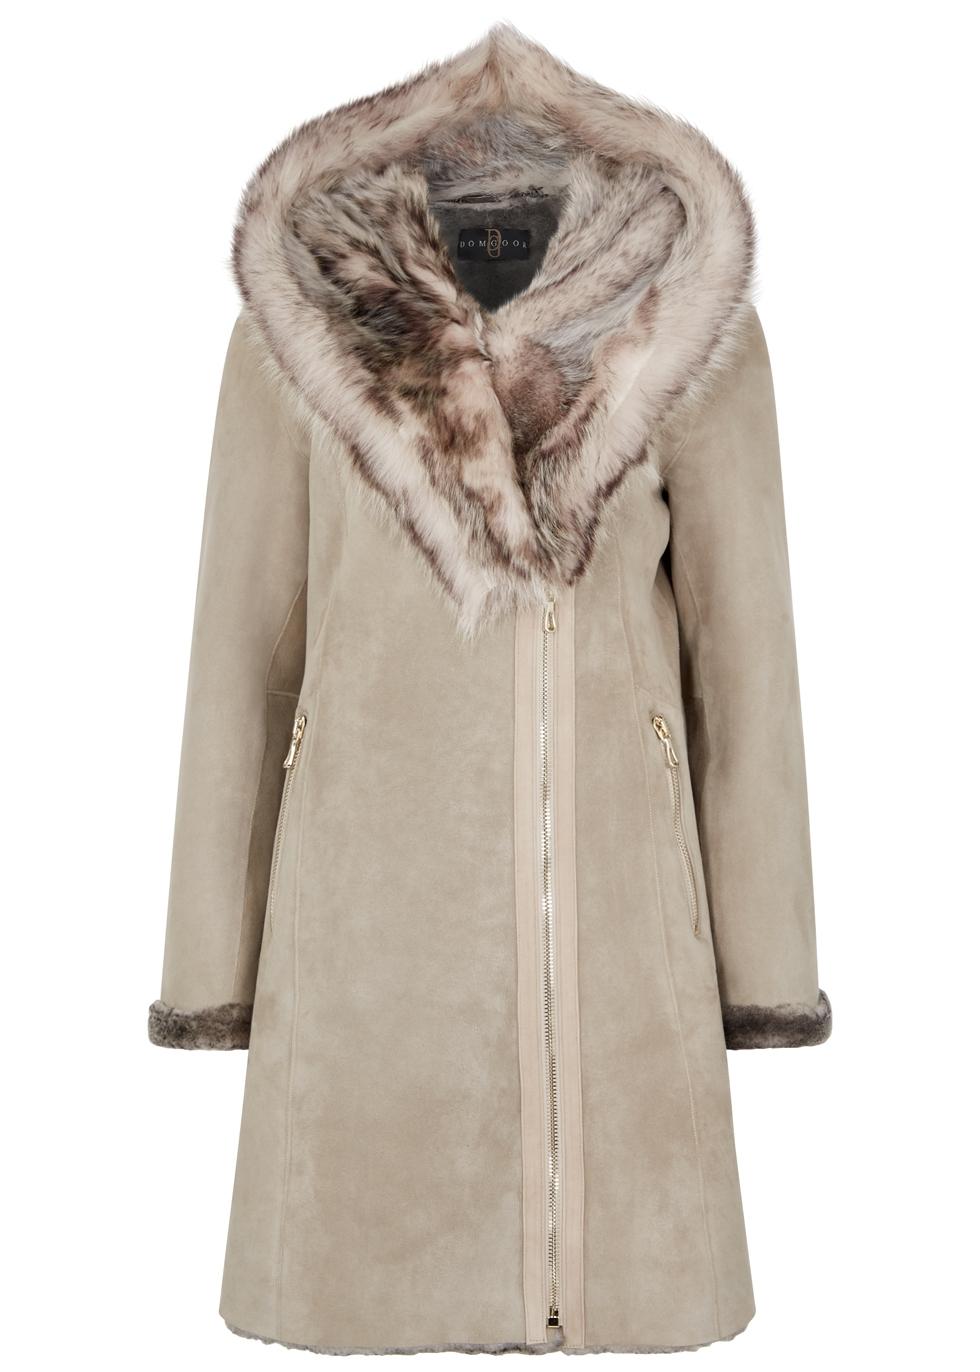 DOM GOOR Grey Fur-Trimmed Shearling Coat in Light Grey